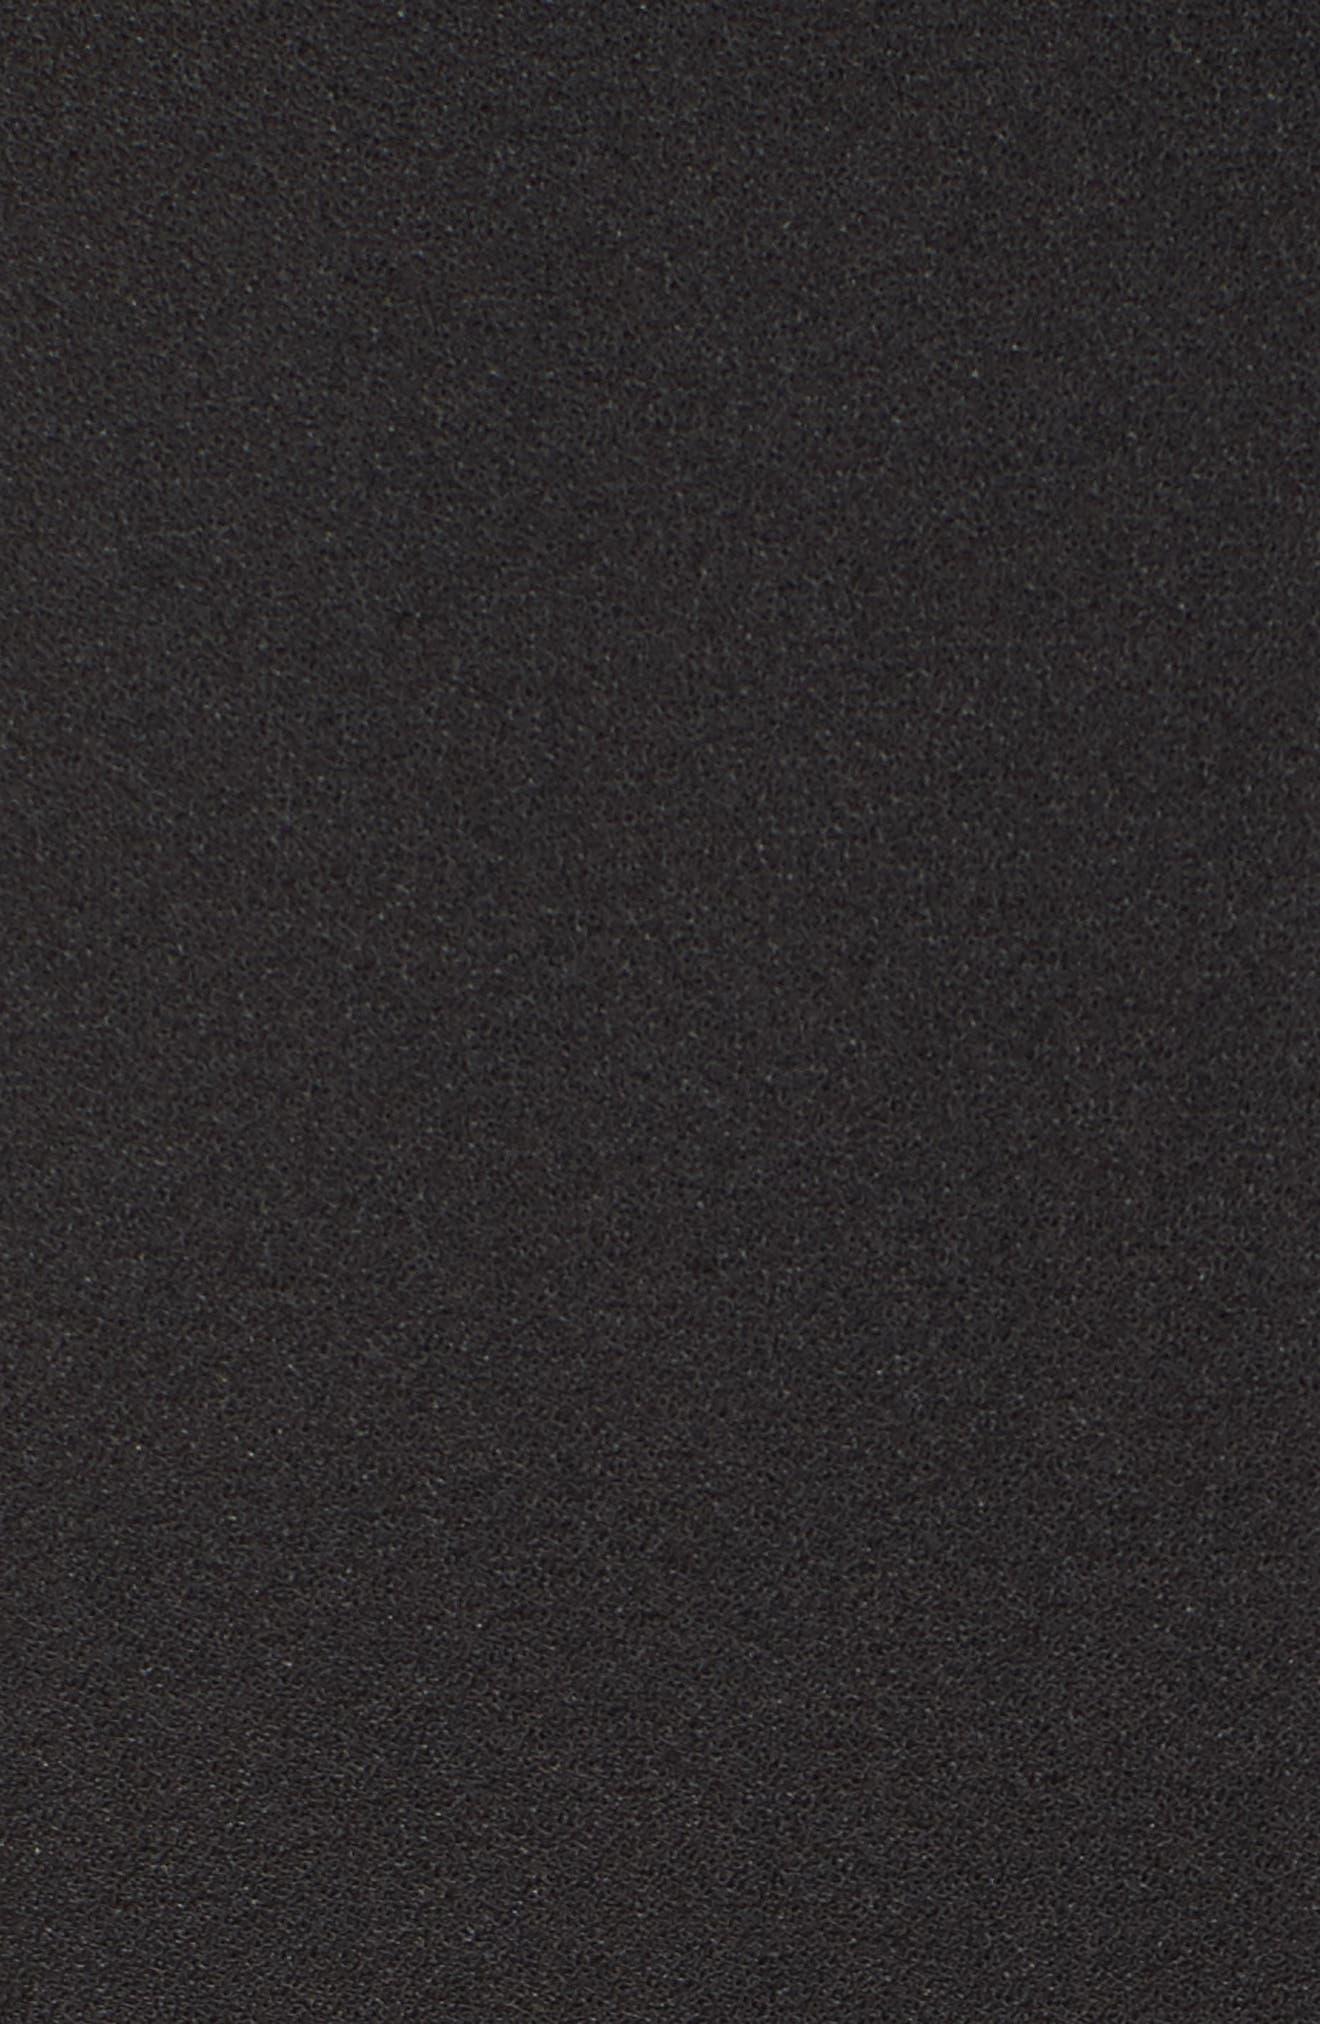 Fusion Halter Style Fit & Flare Dress,                             Alternate thumbnail 6, color,                             Black